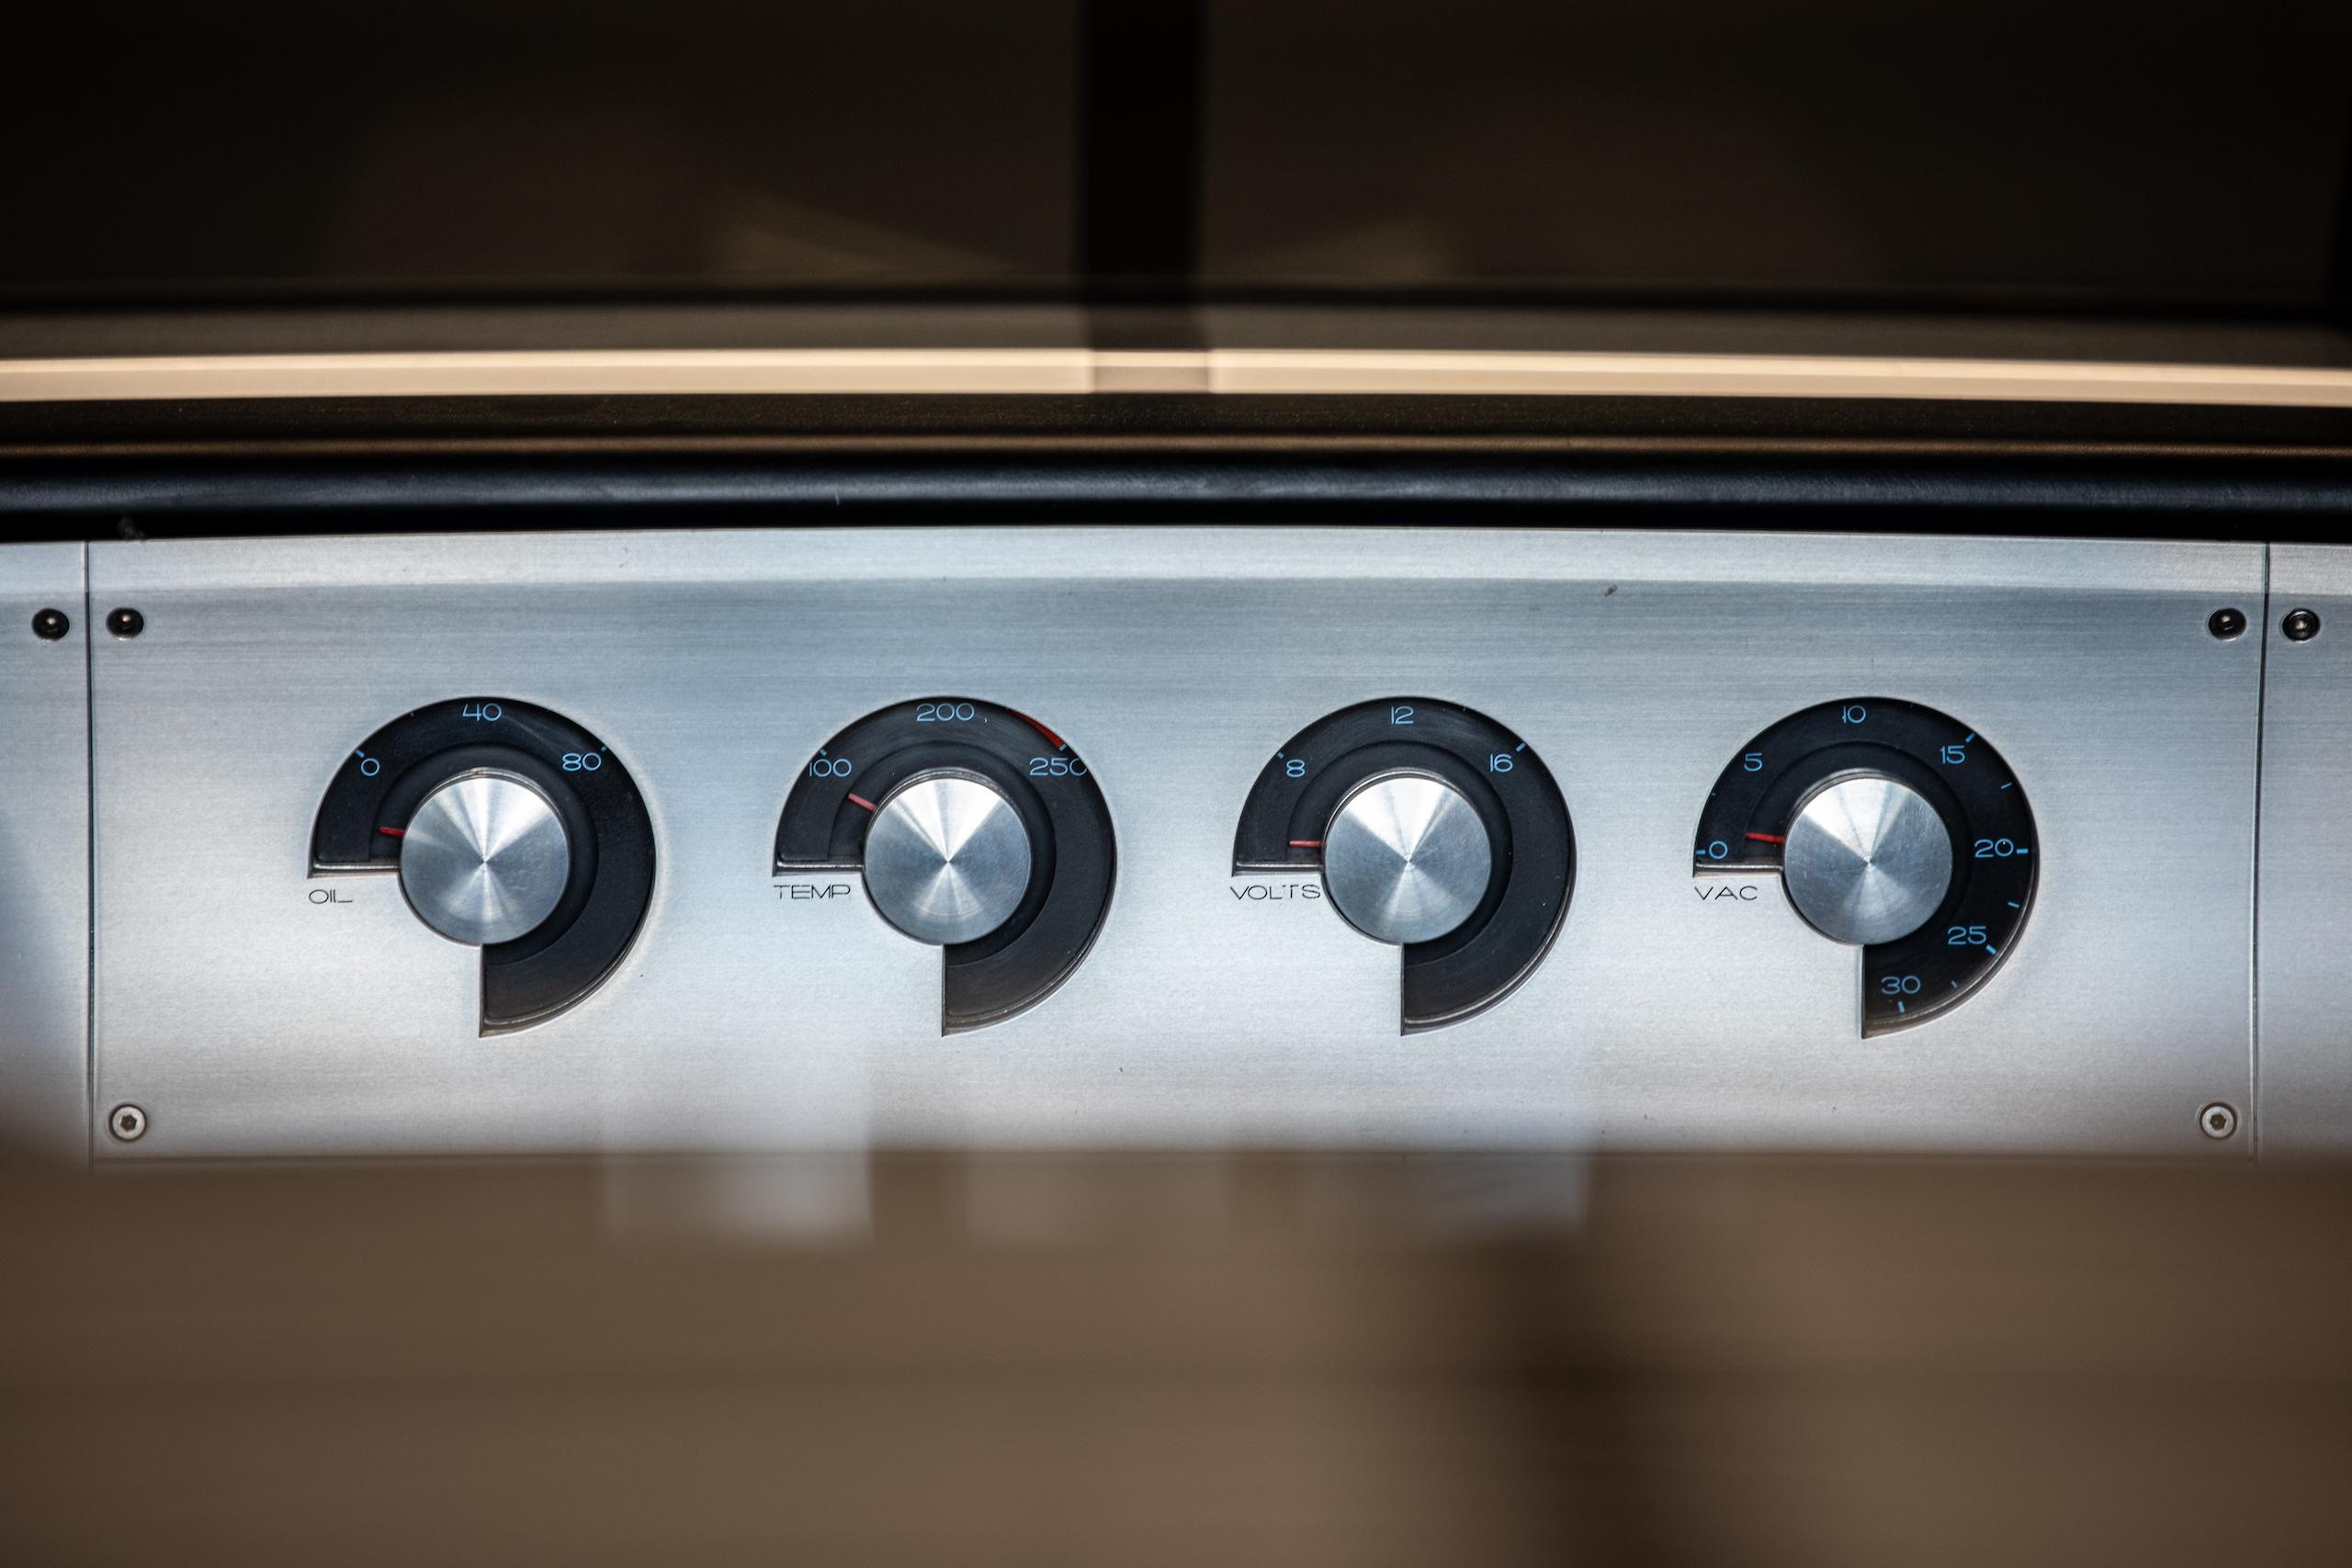 Cobra Concept dash gauges detail